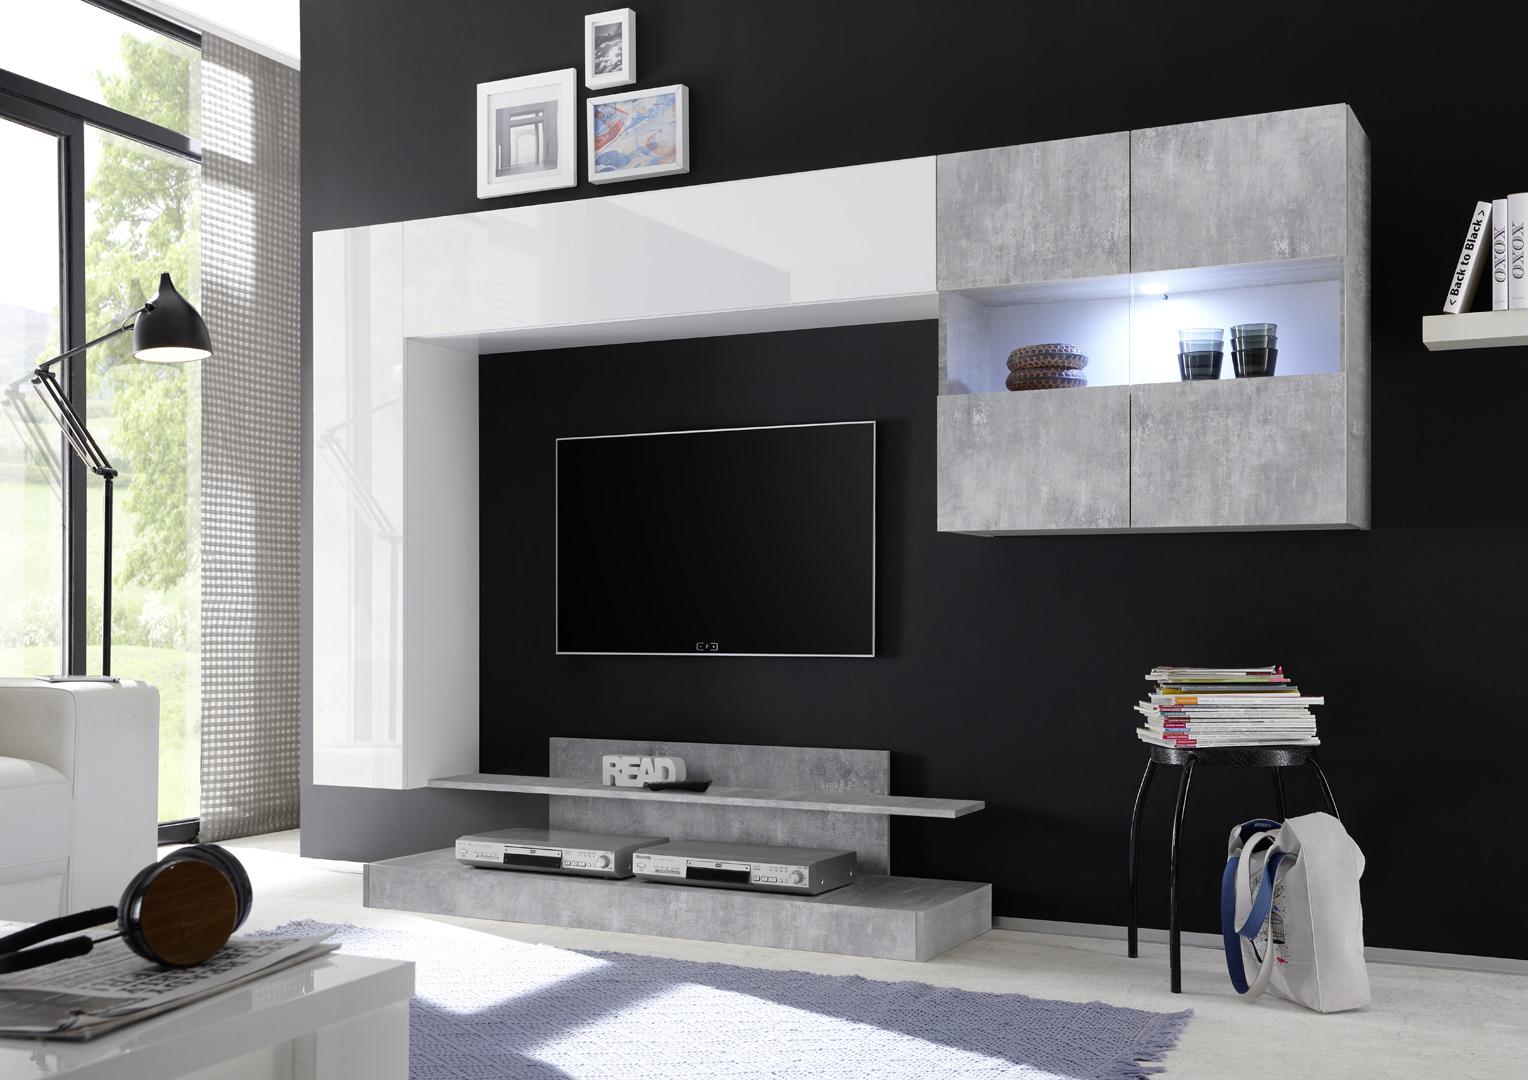 Ensemble TV mural design blanc laqué/béton Camargue